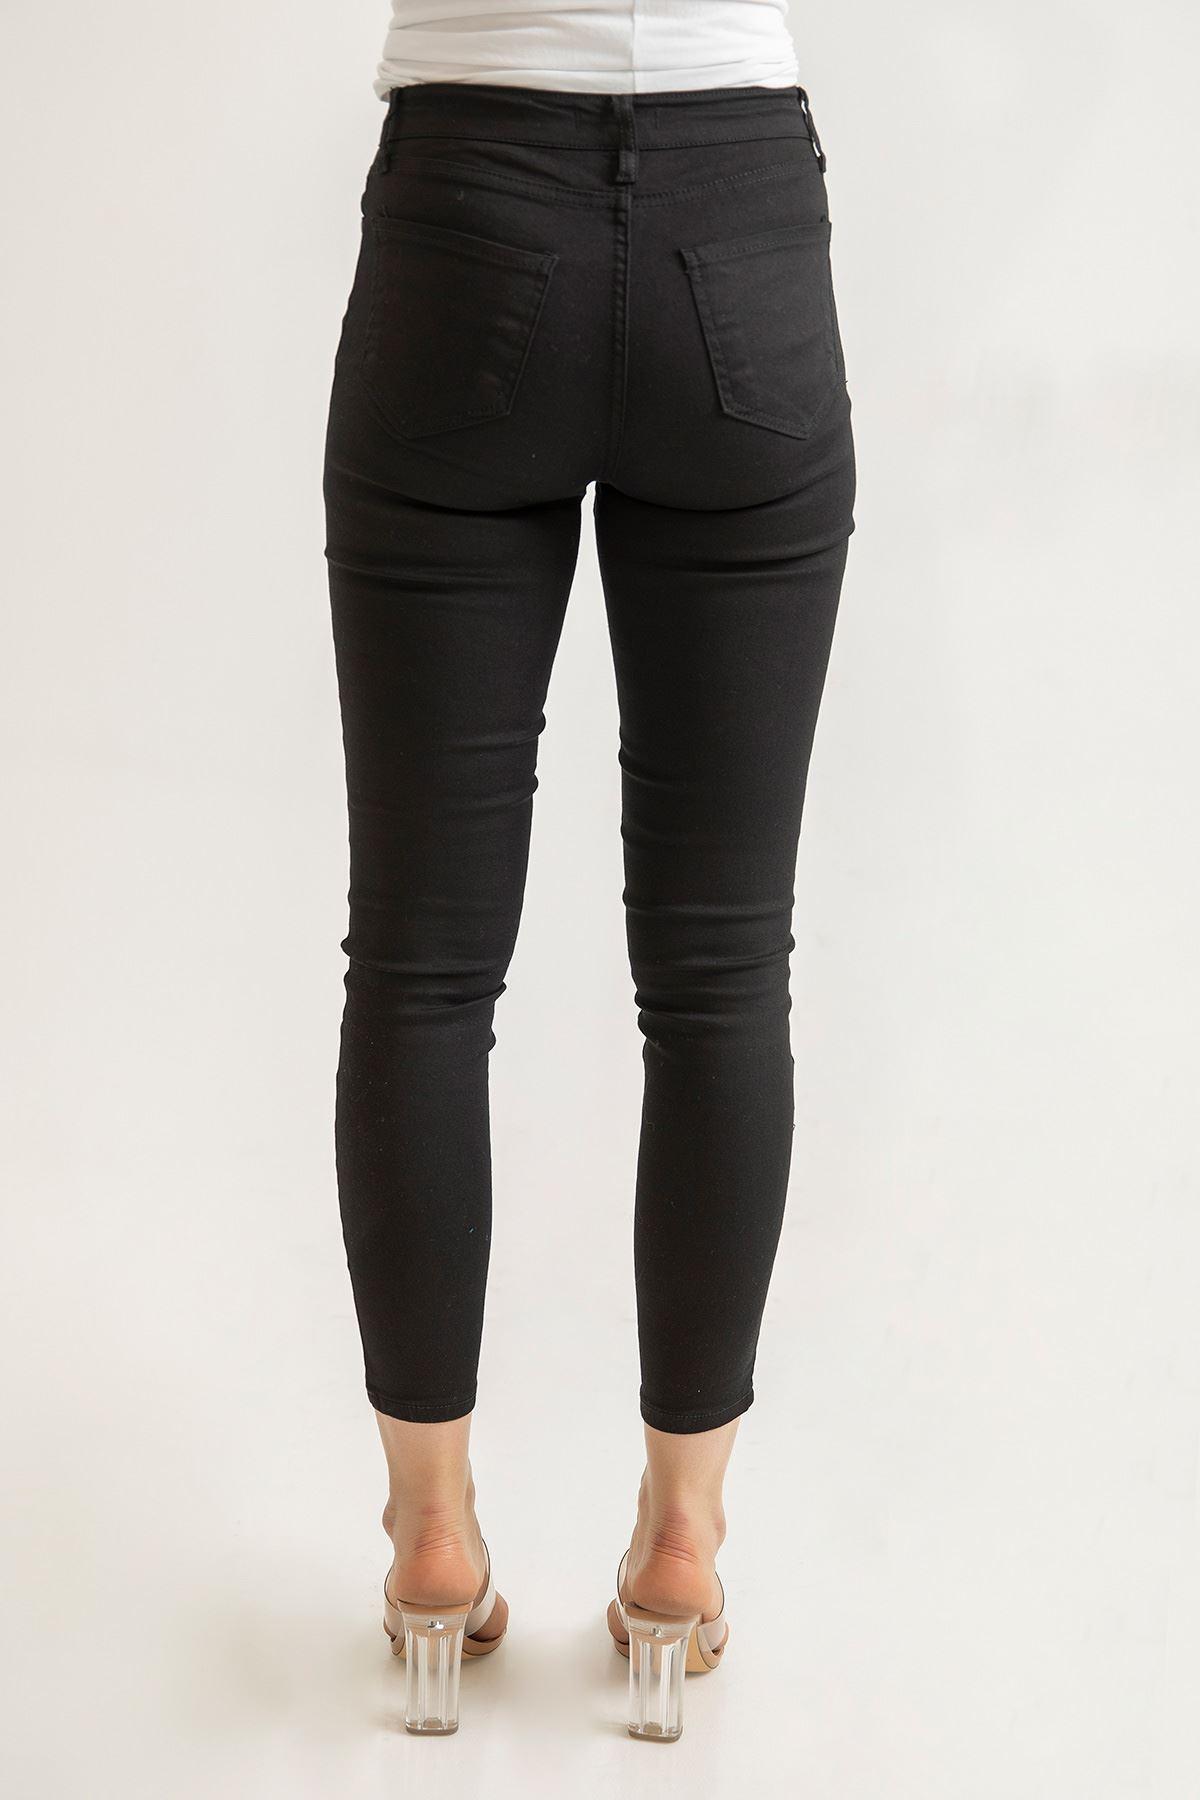 Siyah Cepli Skinny Jean Pantolon-Siyah